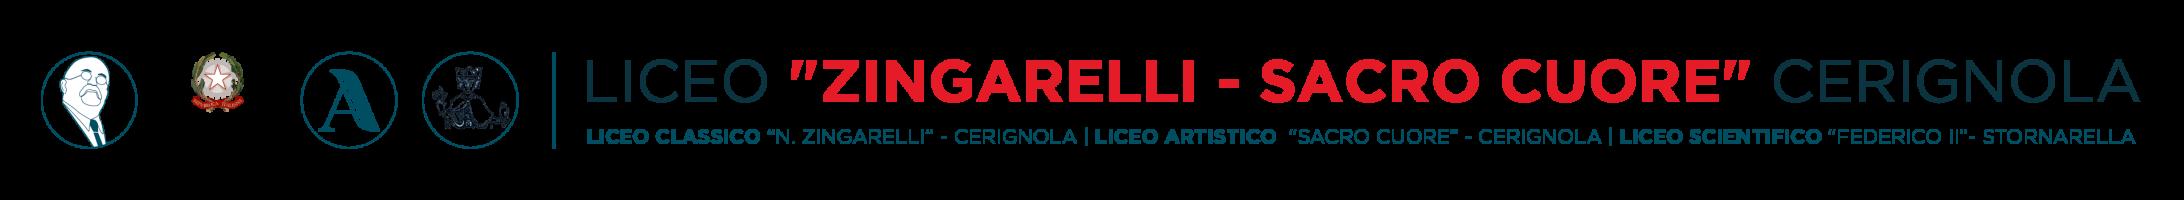 Liceo Zingarelli Sacro Cuore Area Elearning